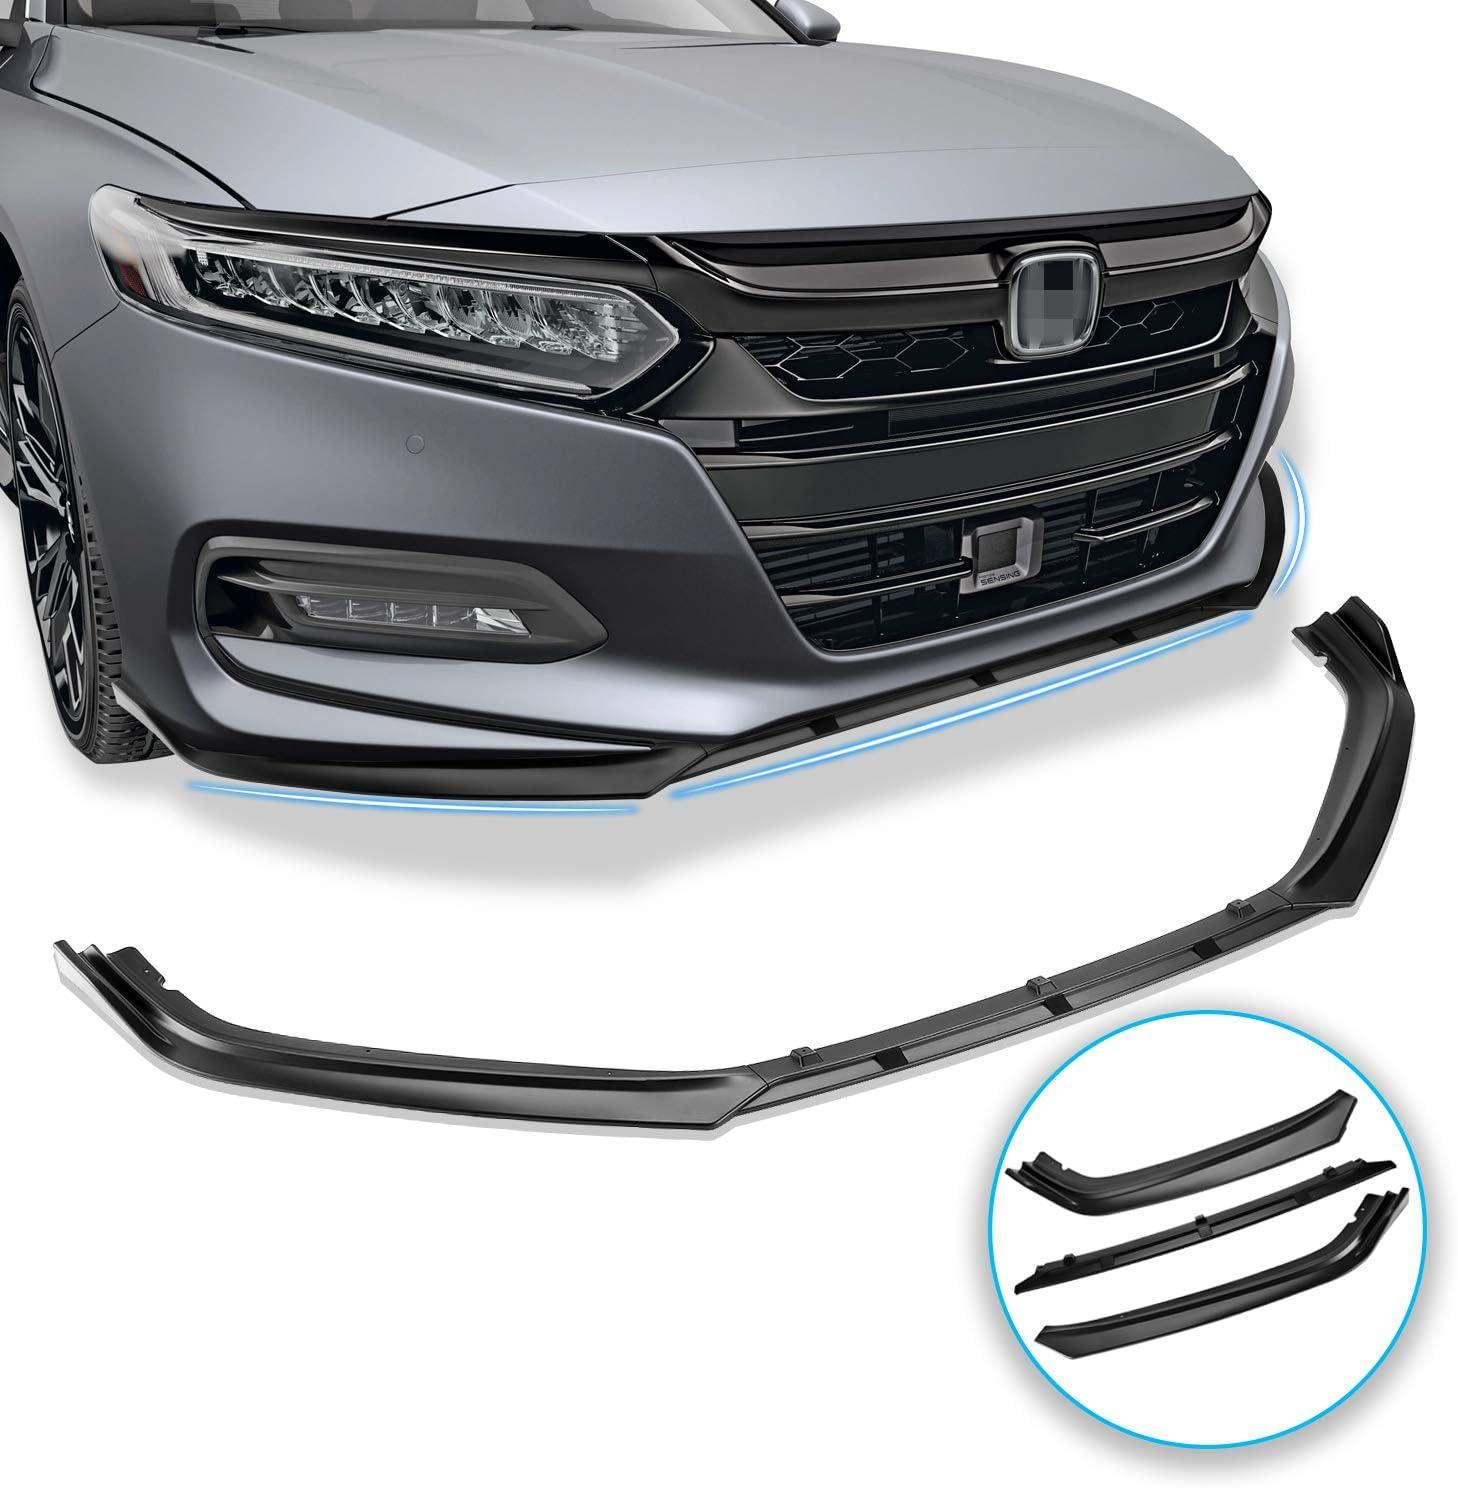 Glossy Black Lip Spoiler Kit Fits for 2018-2019 Honda Accord Akasaka 5 Pieces Design Painted Still Night Pearl Blue Front Bumper Splitter